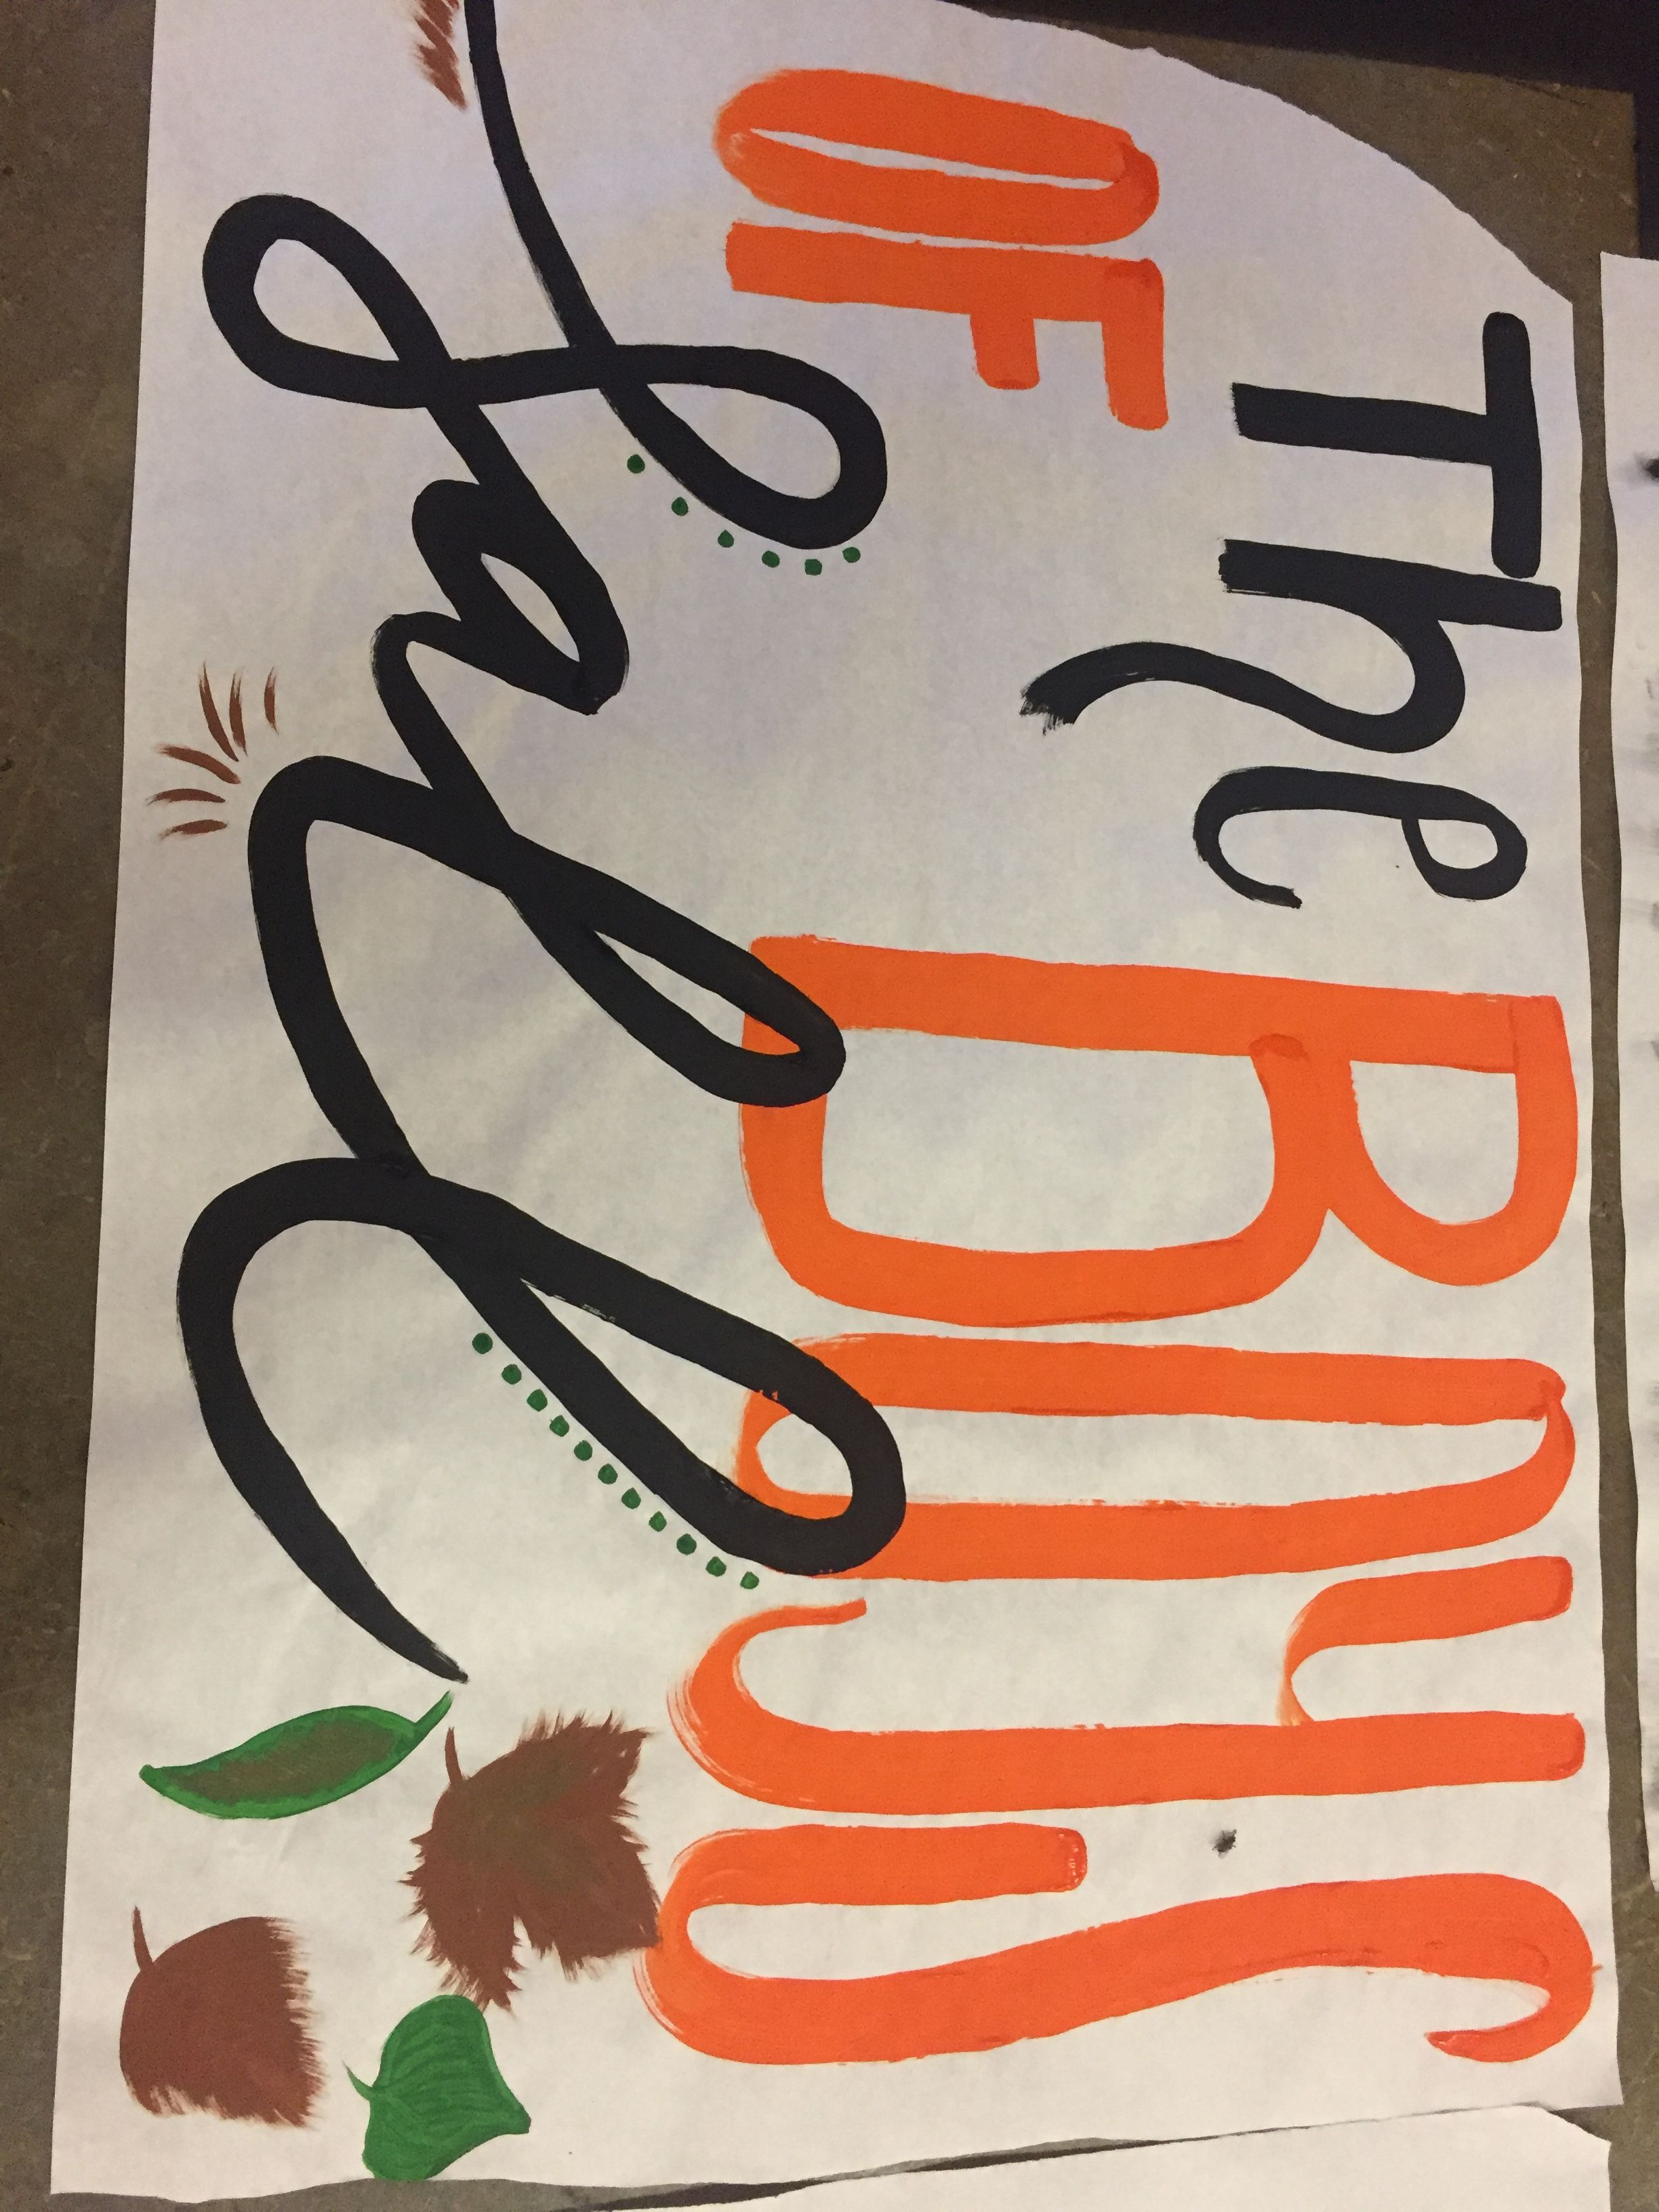 Pin By Tawala Tipton On Football Signs Cheerleading Signs Cheer Signs Cheer Posters